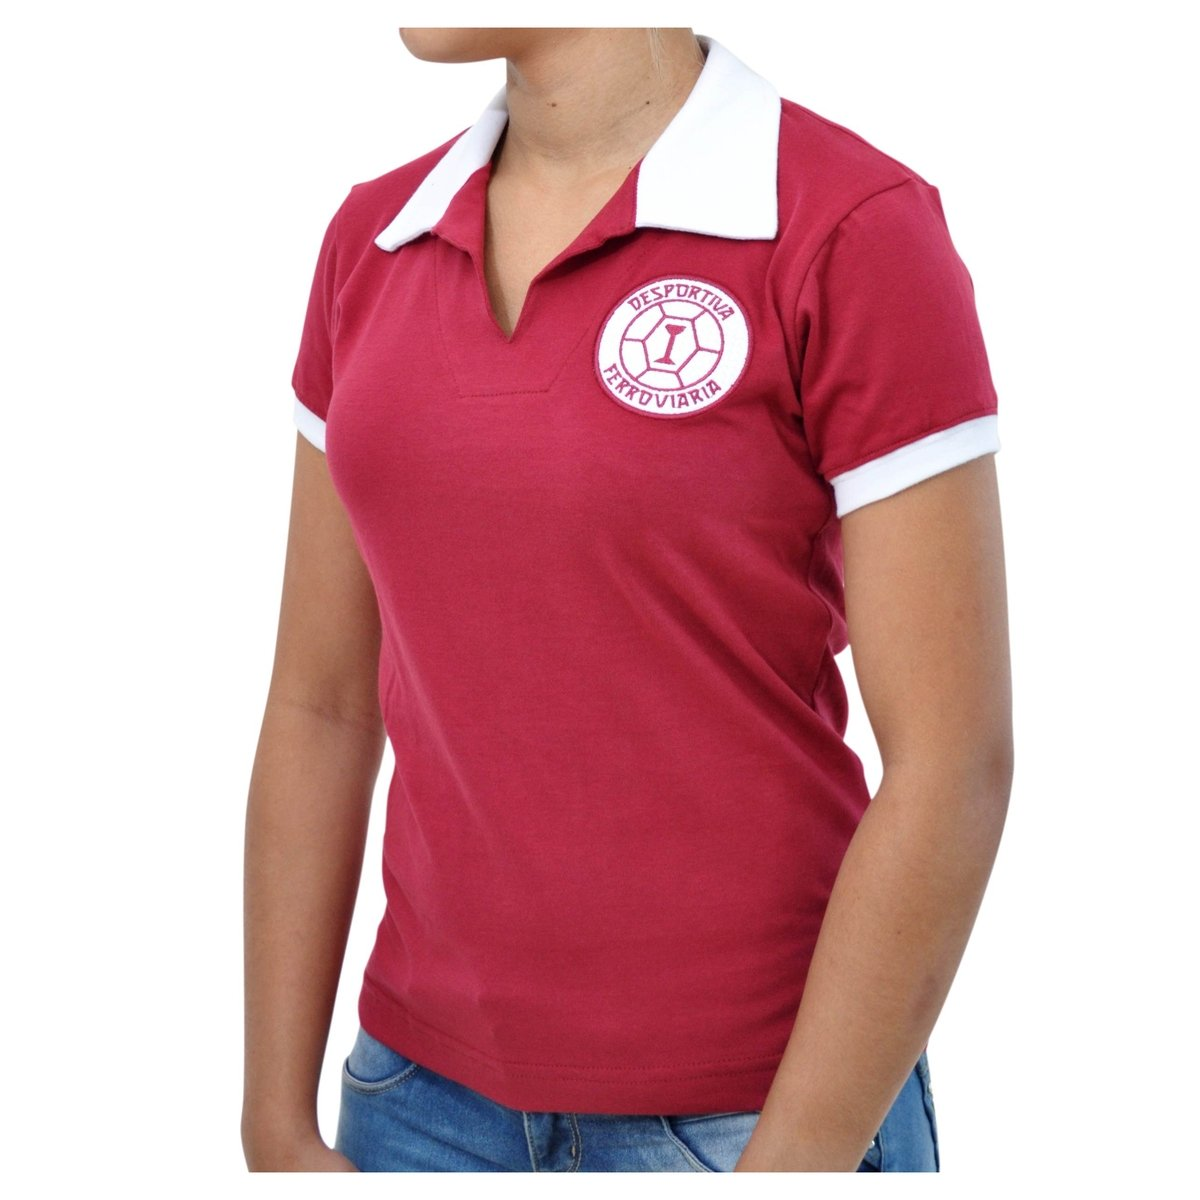 Retrô Mania Vinho Camisa Camisa Retrô Feminina Desportiva Desportiva 1965 Ferroviária Mania Feminina X6A6Ux